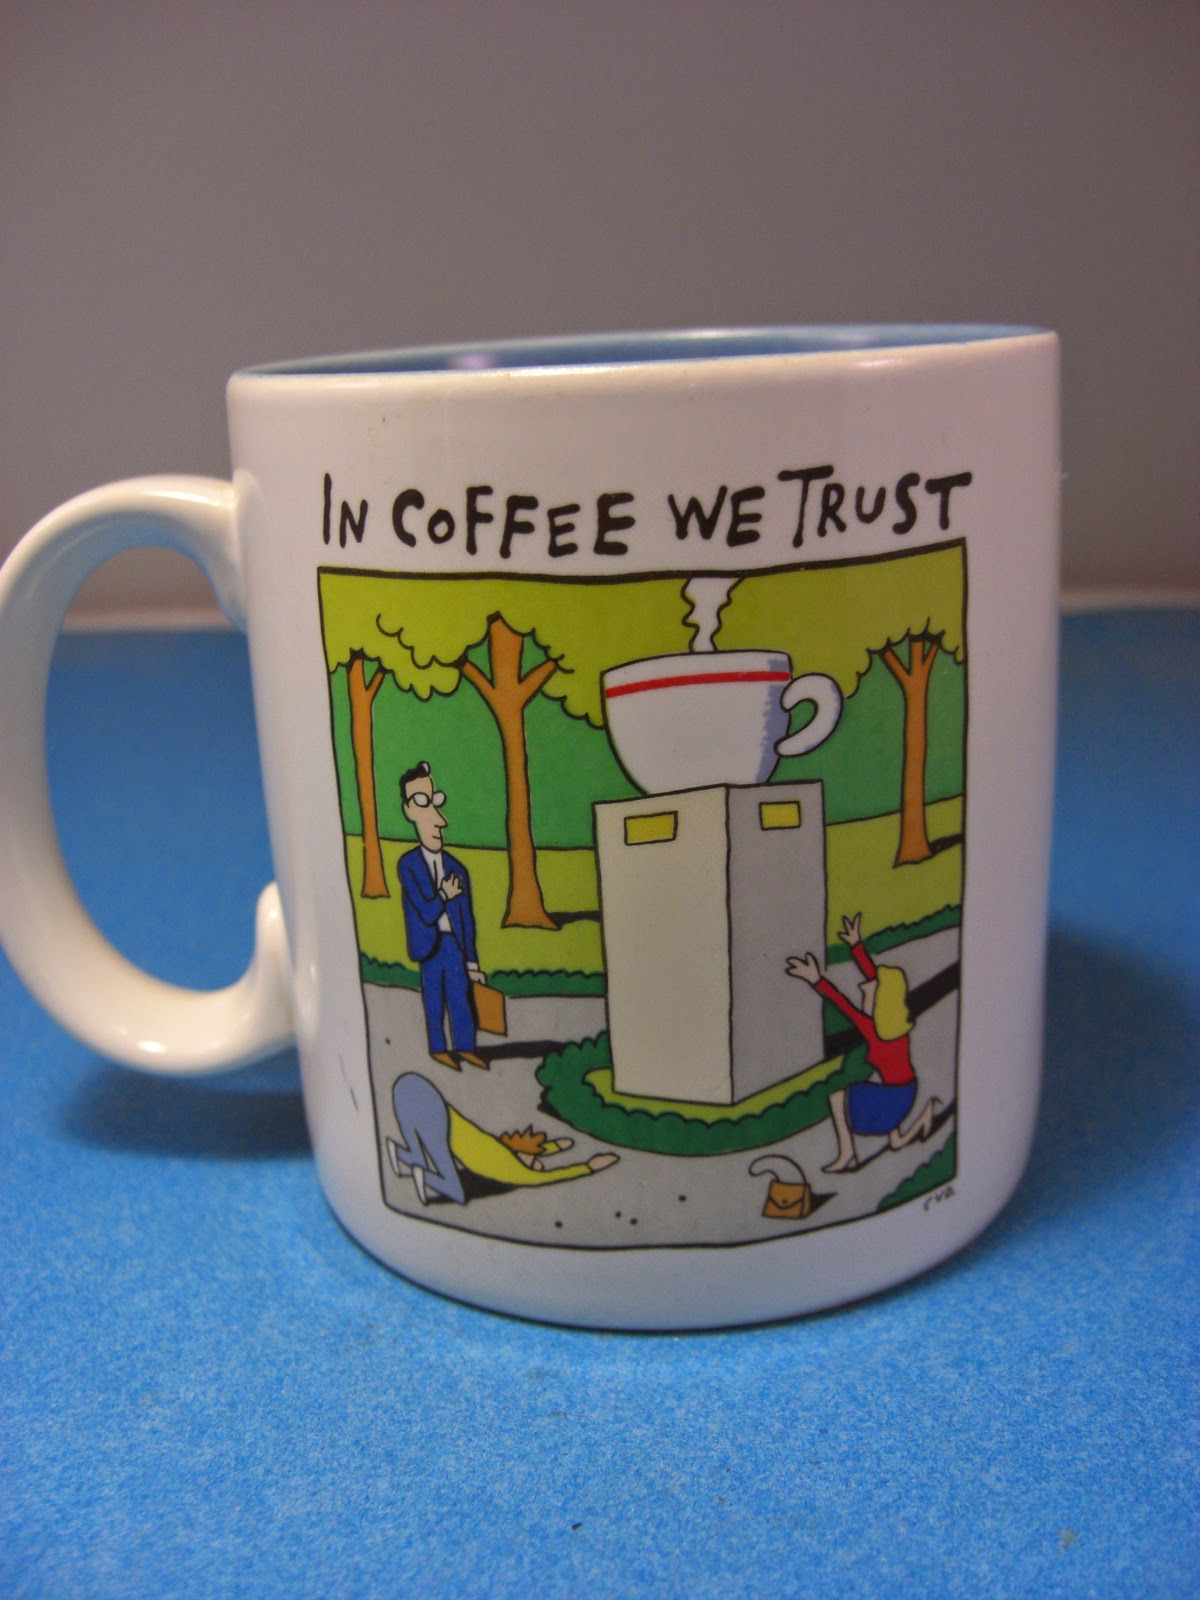 http://bargaincart.ecrater.com/p/22229669/in-coffee-we-trust-mug-idol